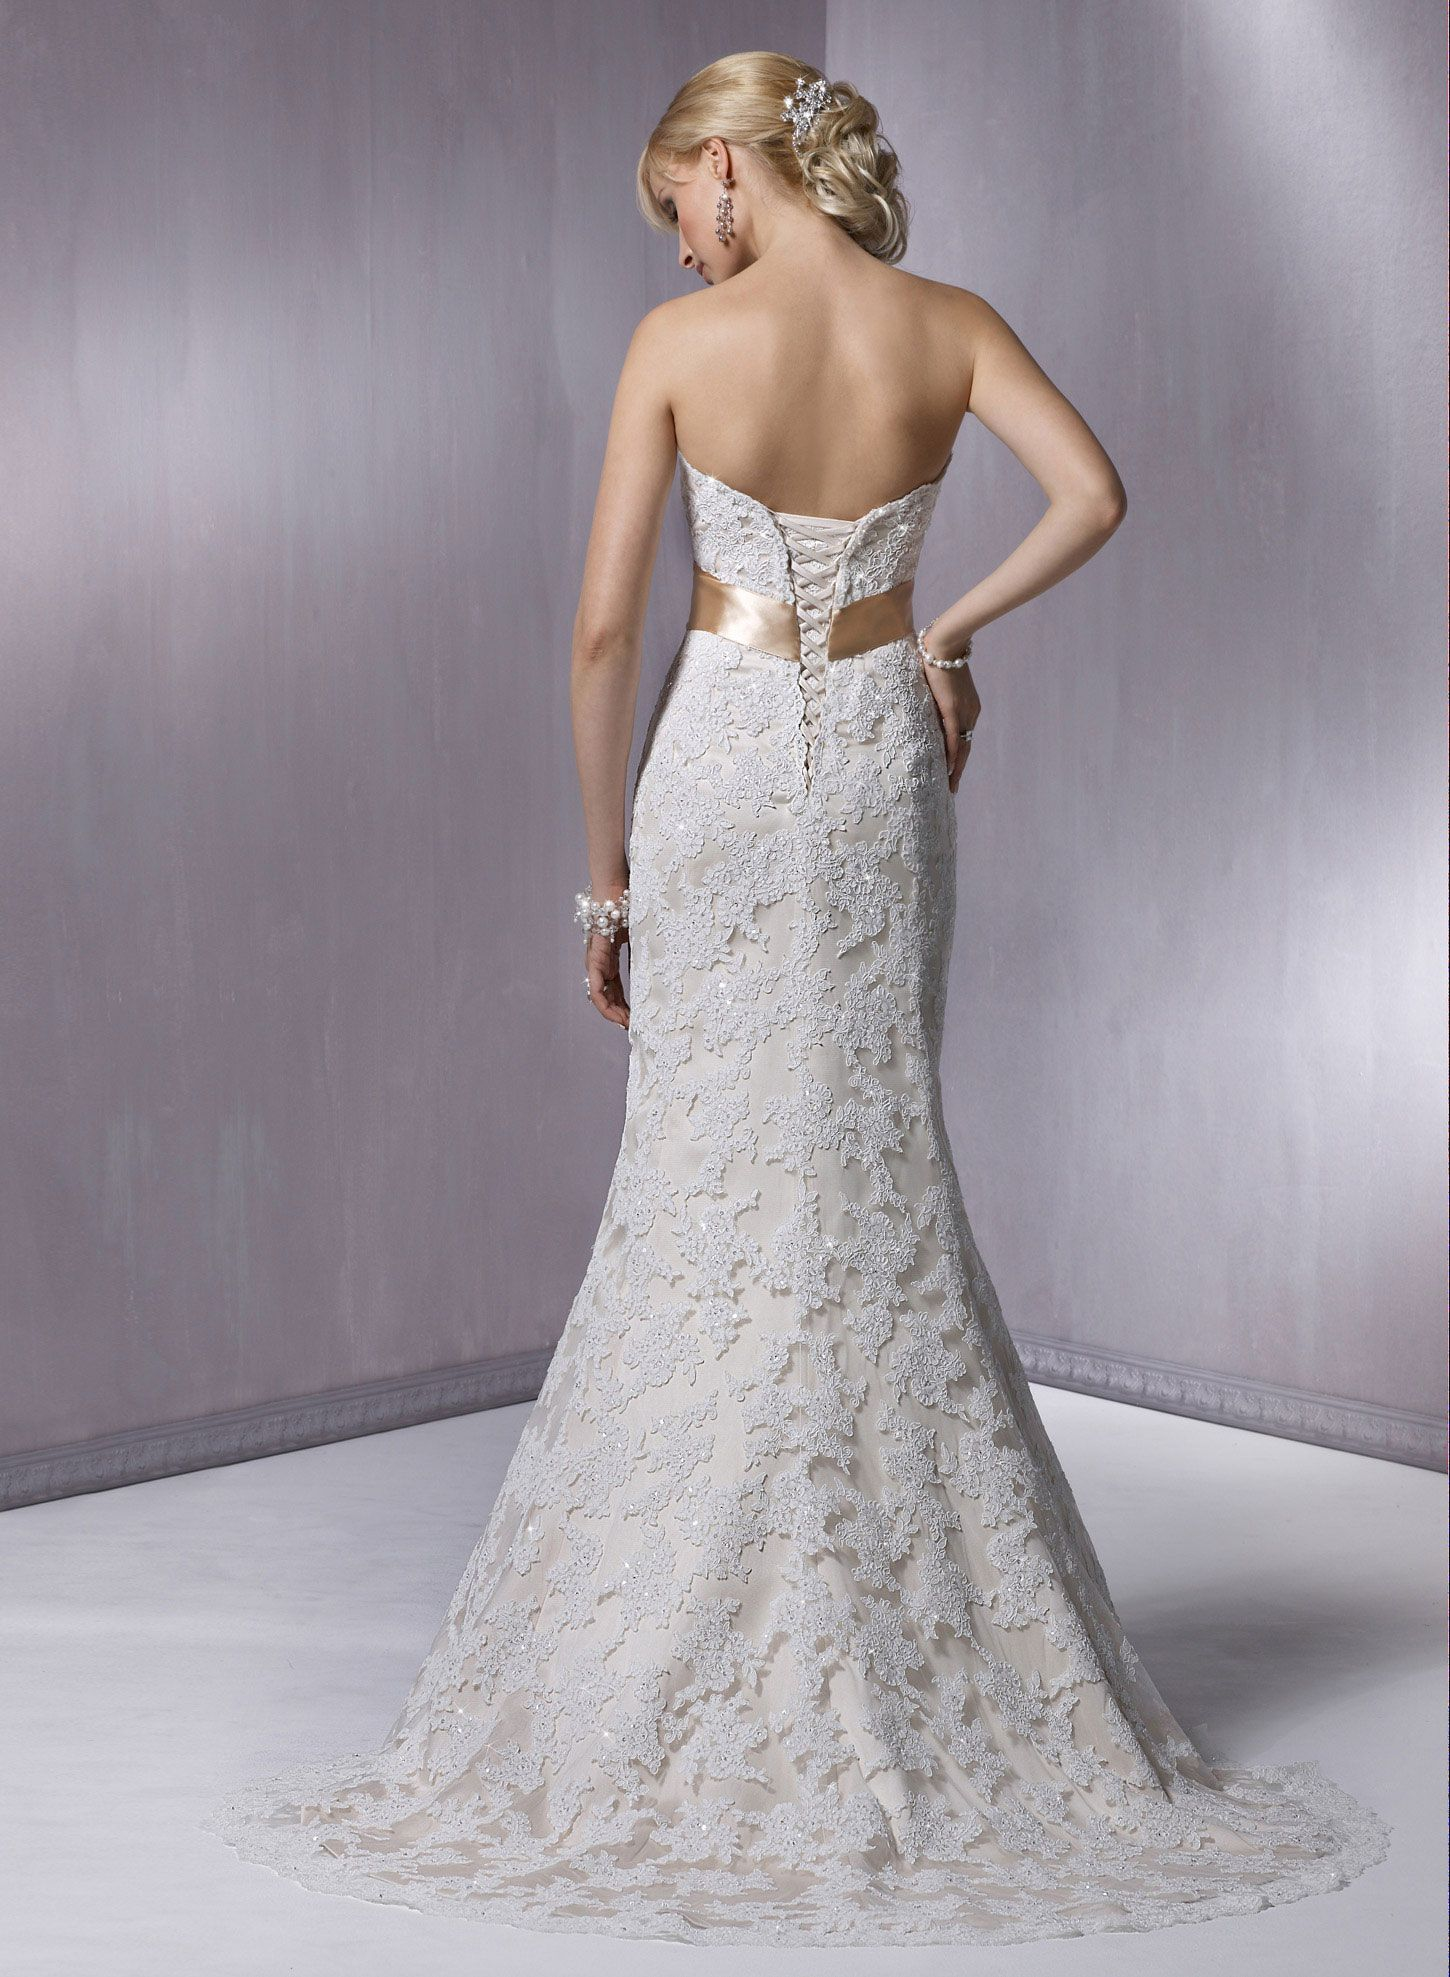 1b7823c137472 Karena Royale - by Maggie Sottero, in stock, sample size 10. Bridal Boutique,  St. Joseph, Missouri